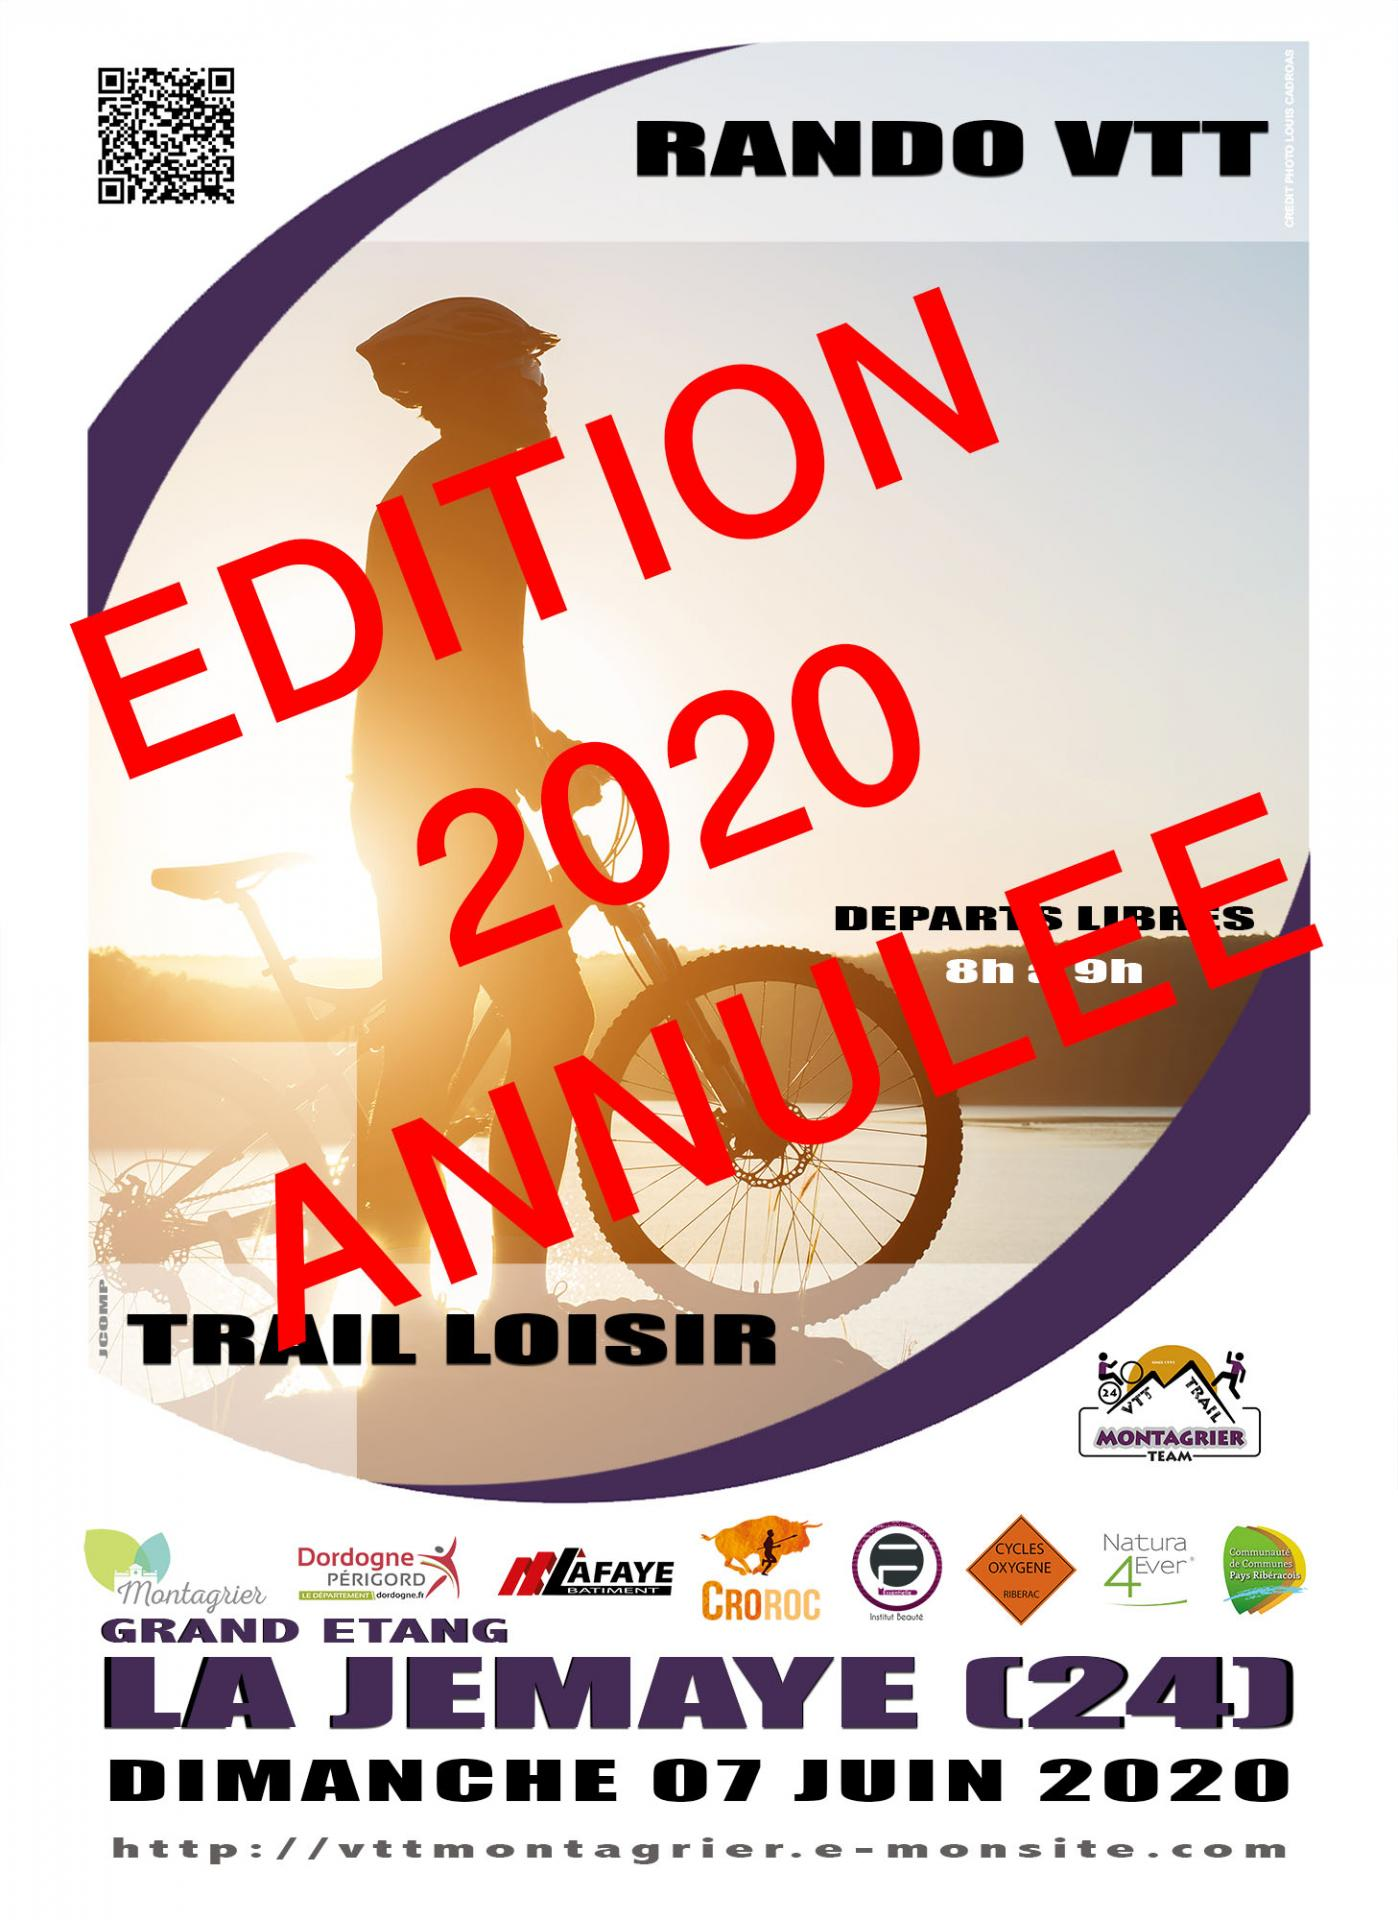 RANDO JEMAYE 2020